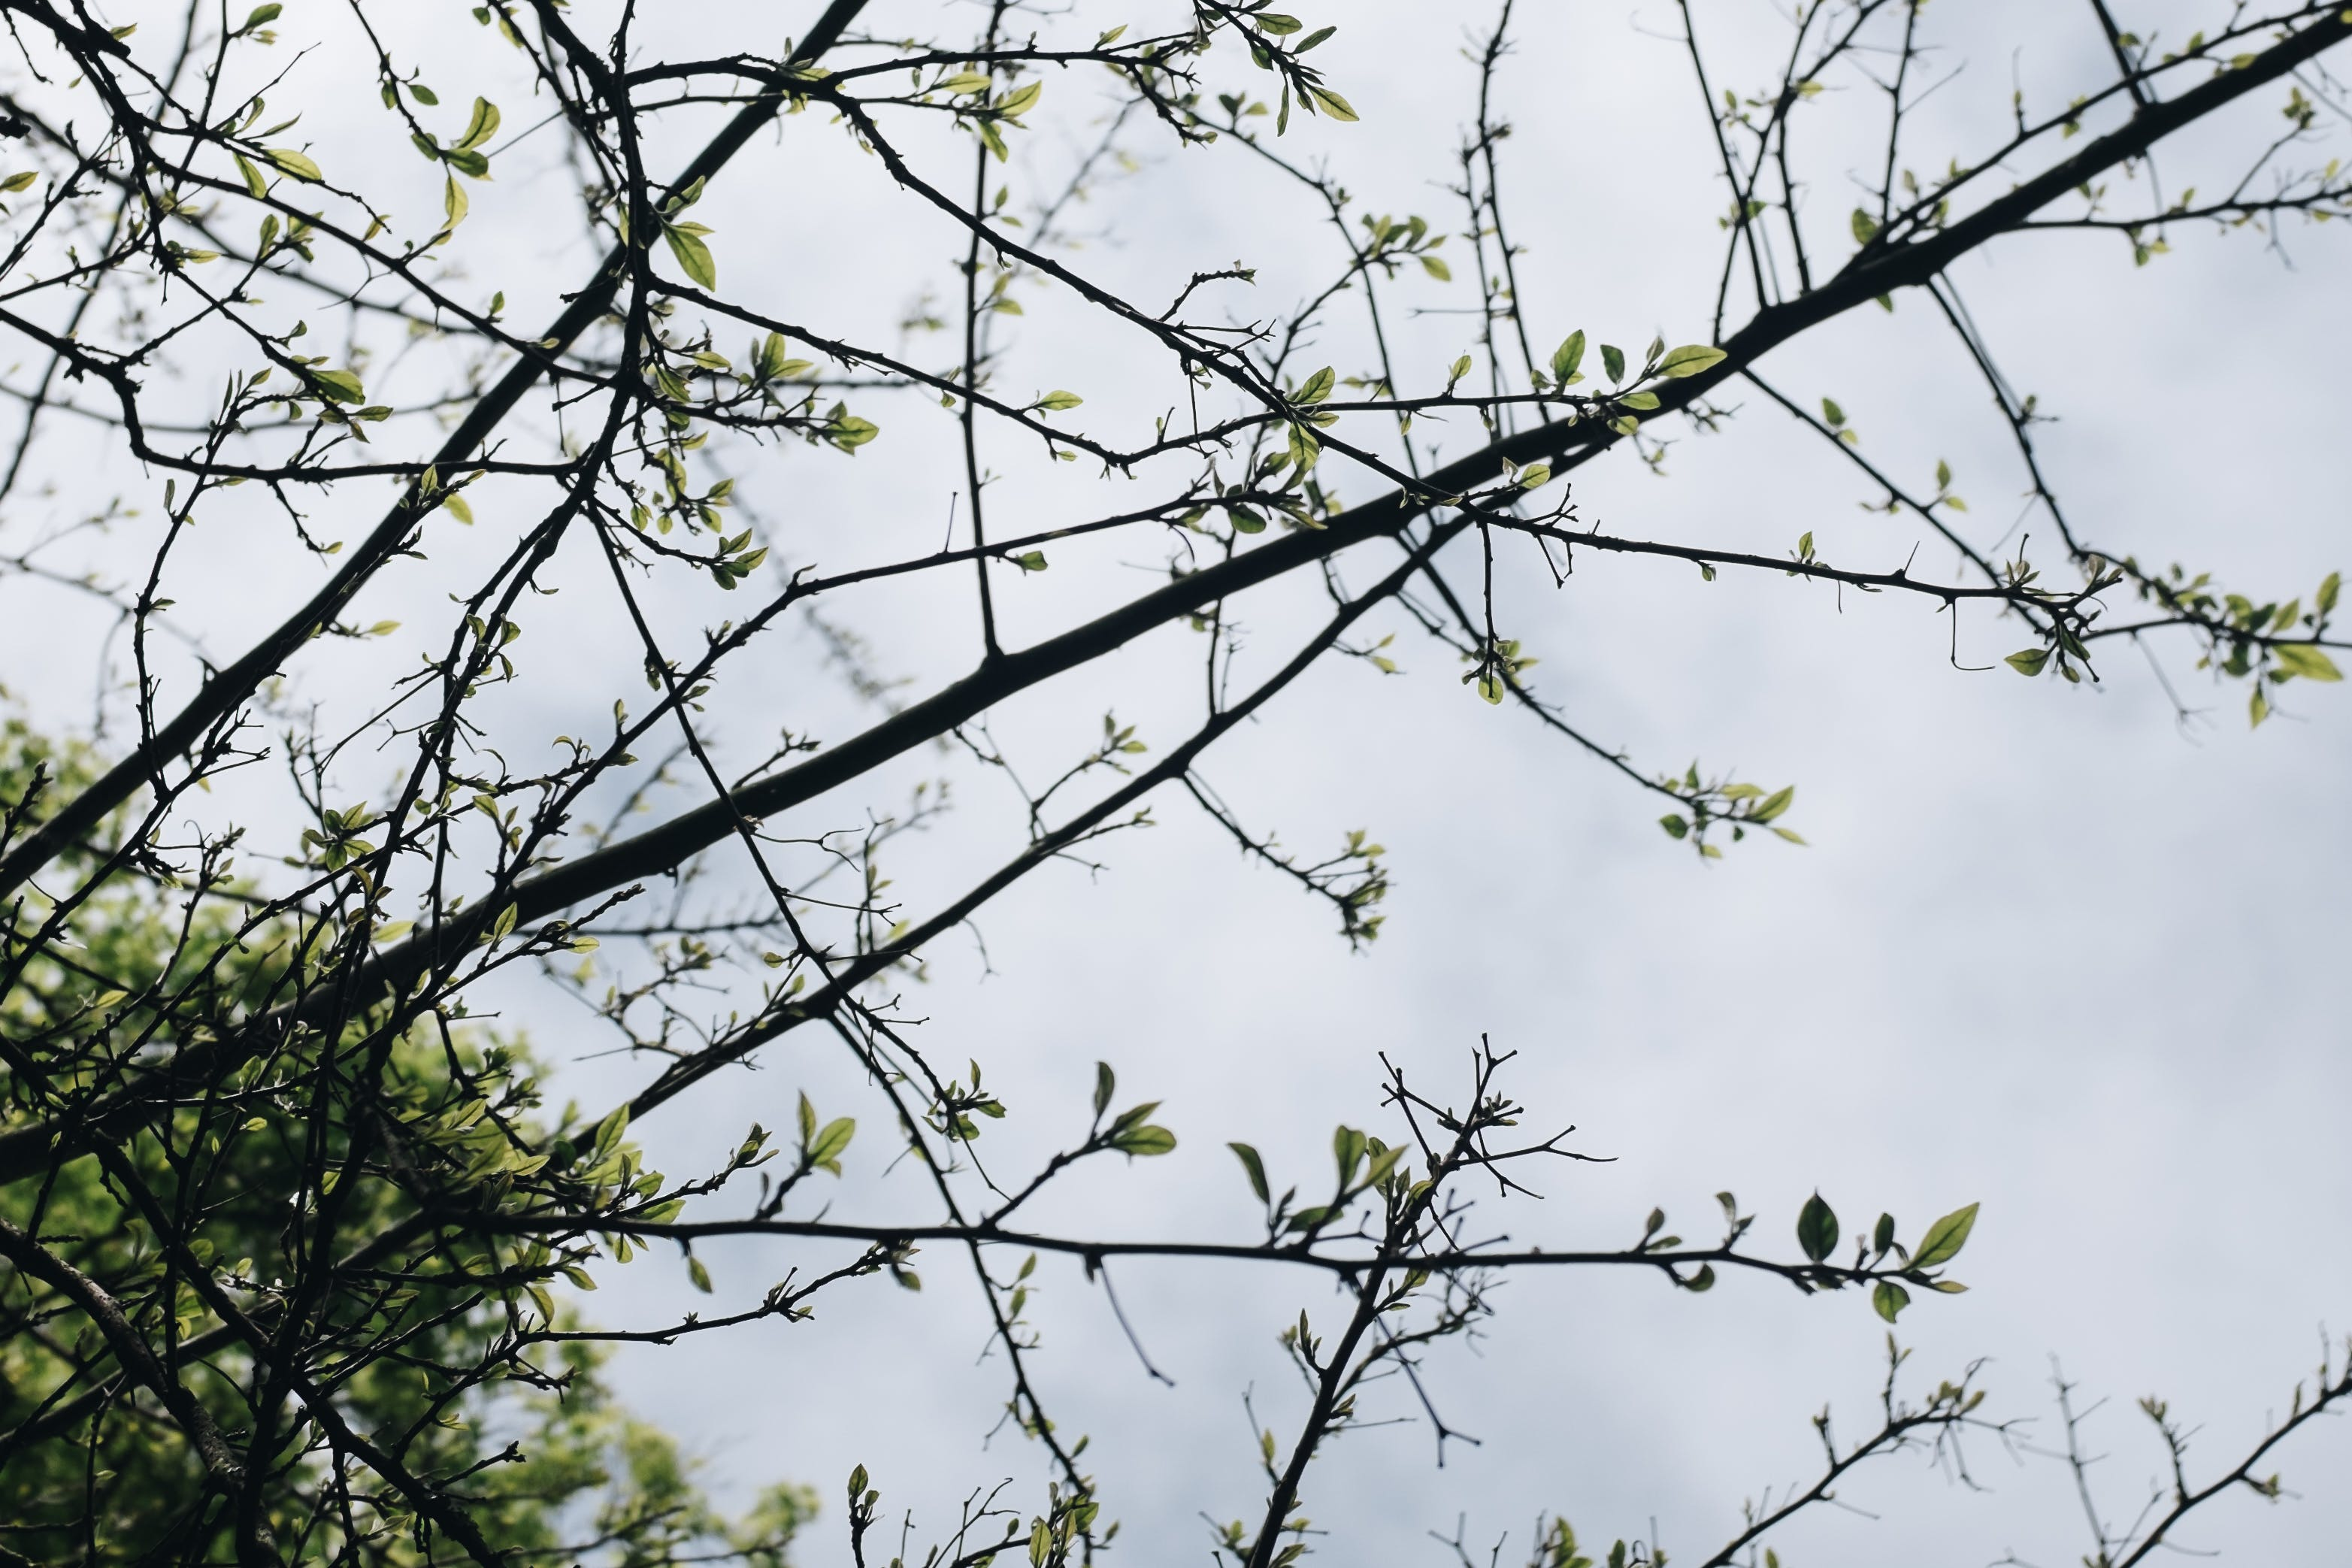 Green Leaf Tree Under White Clouds